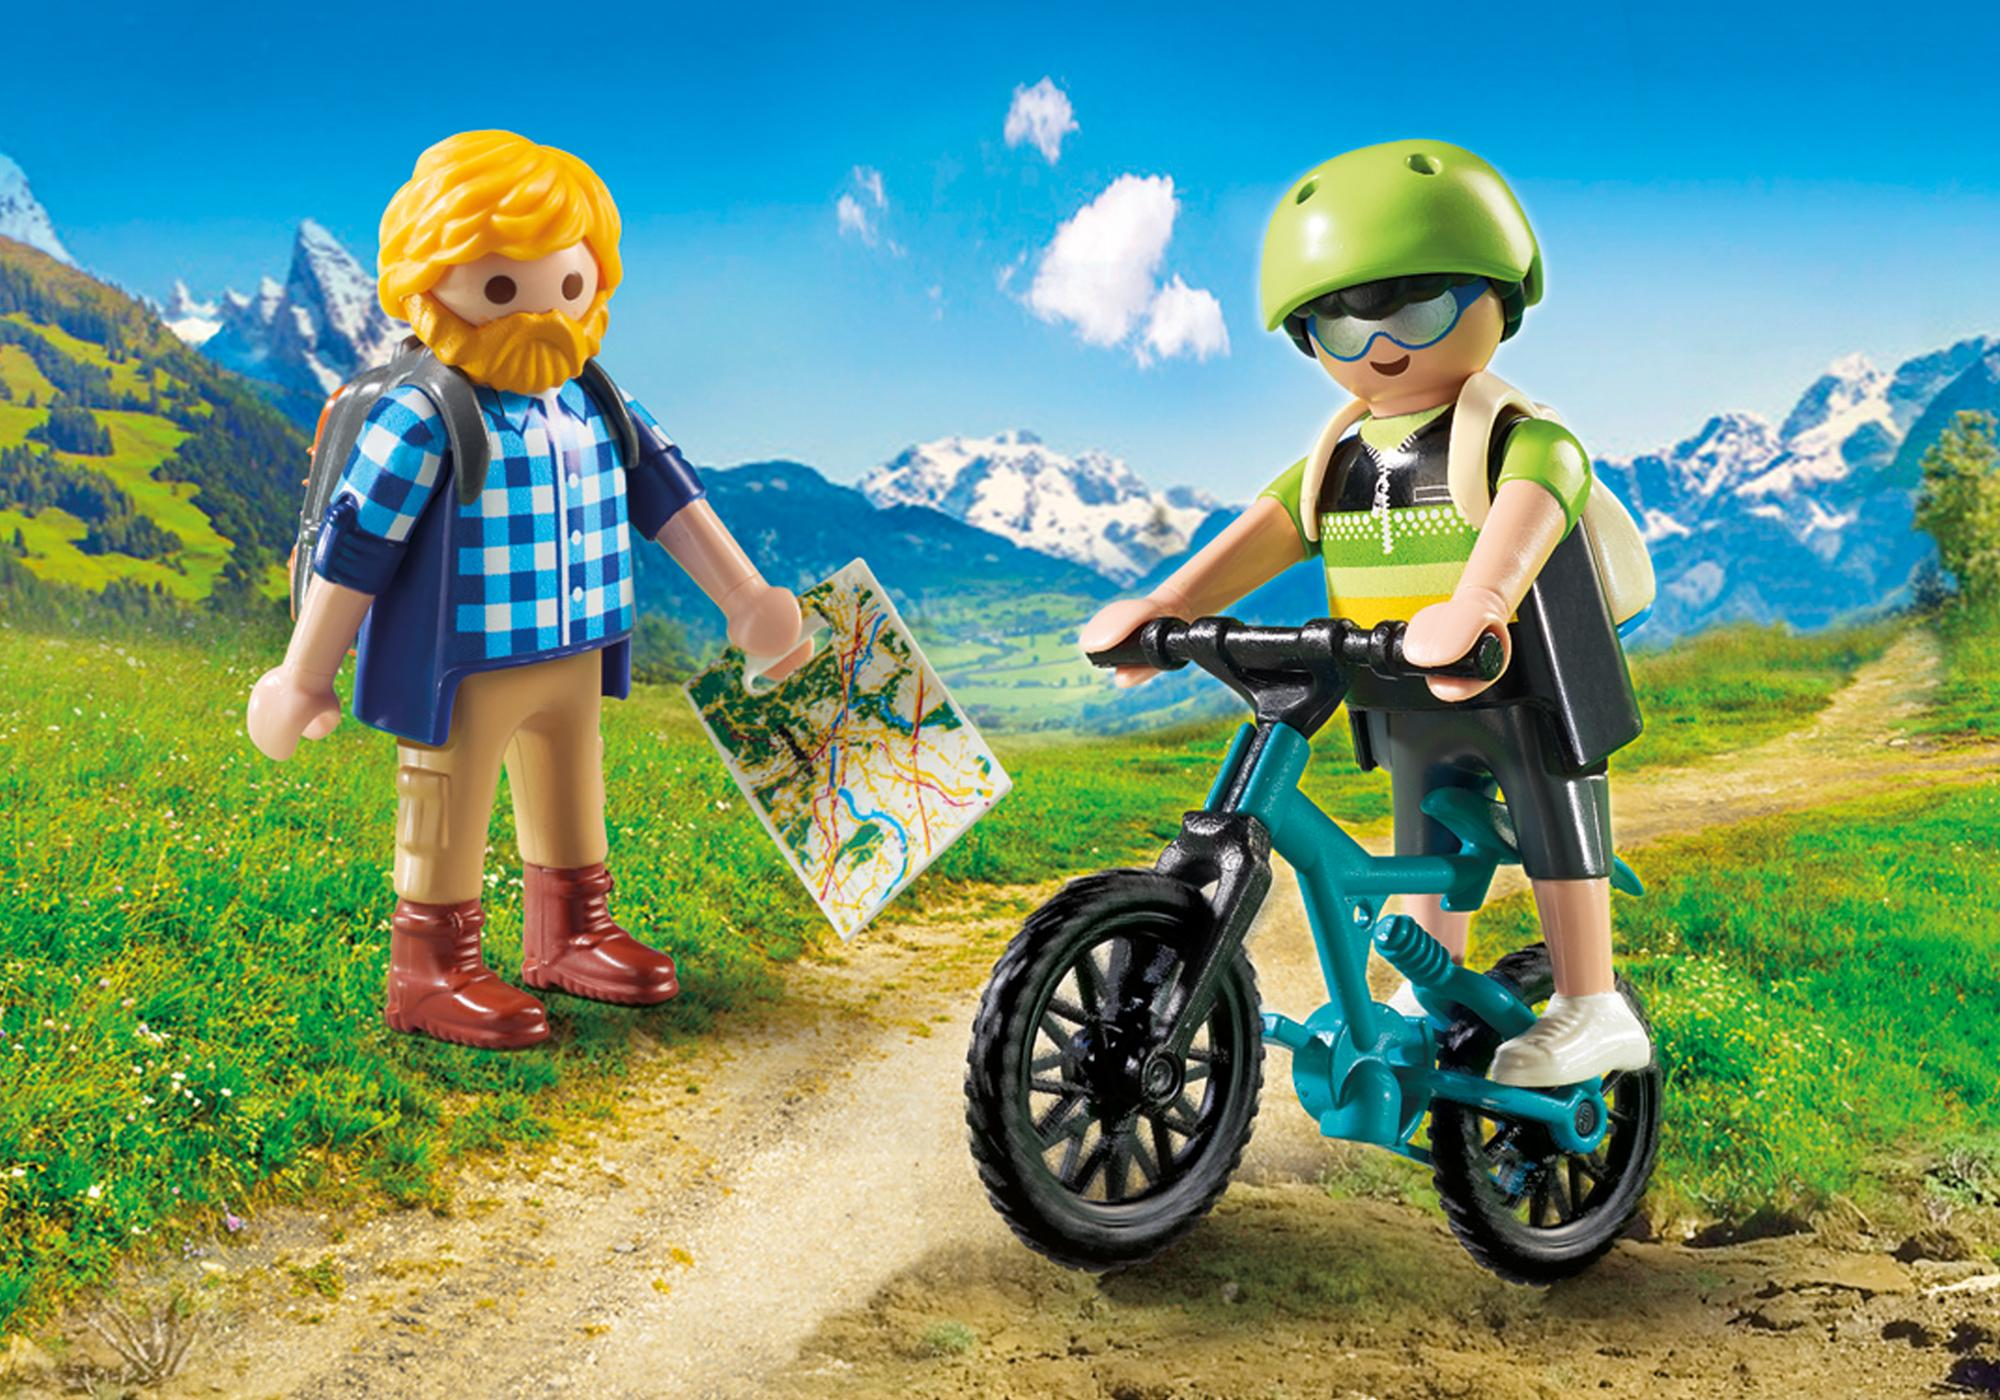 http://media.playmobil.com/i/playmobil/9129_product_detail/Randonneur et cycliste